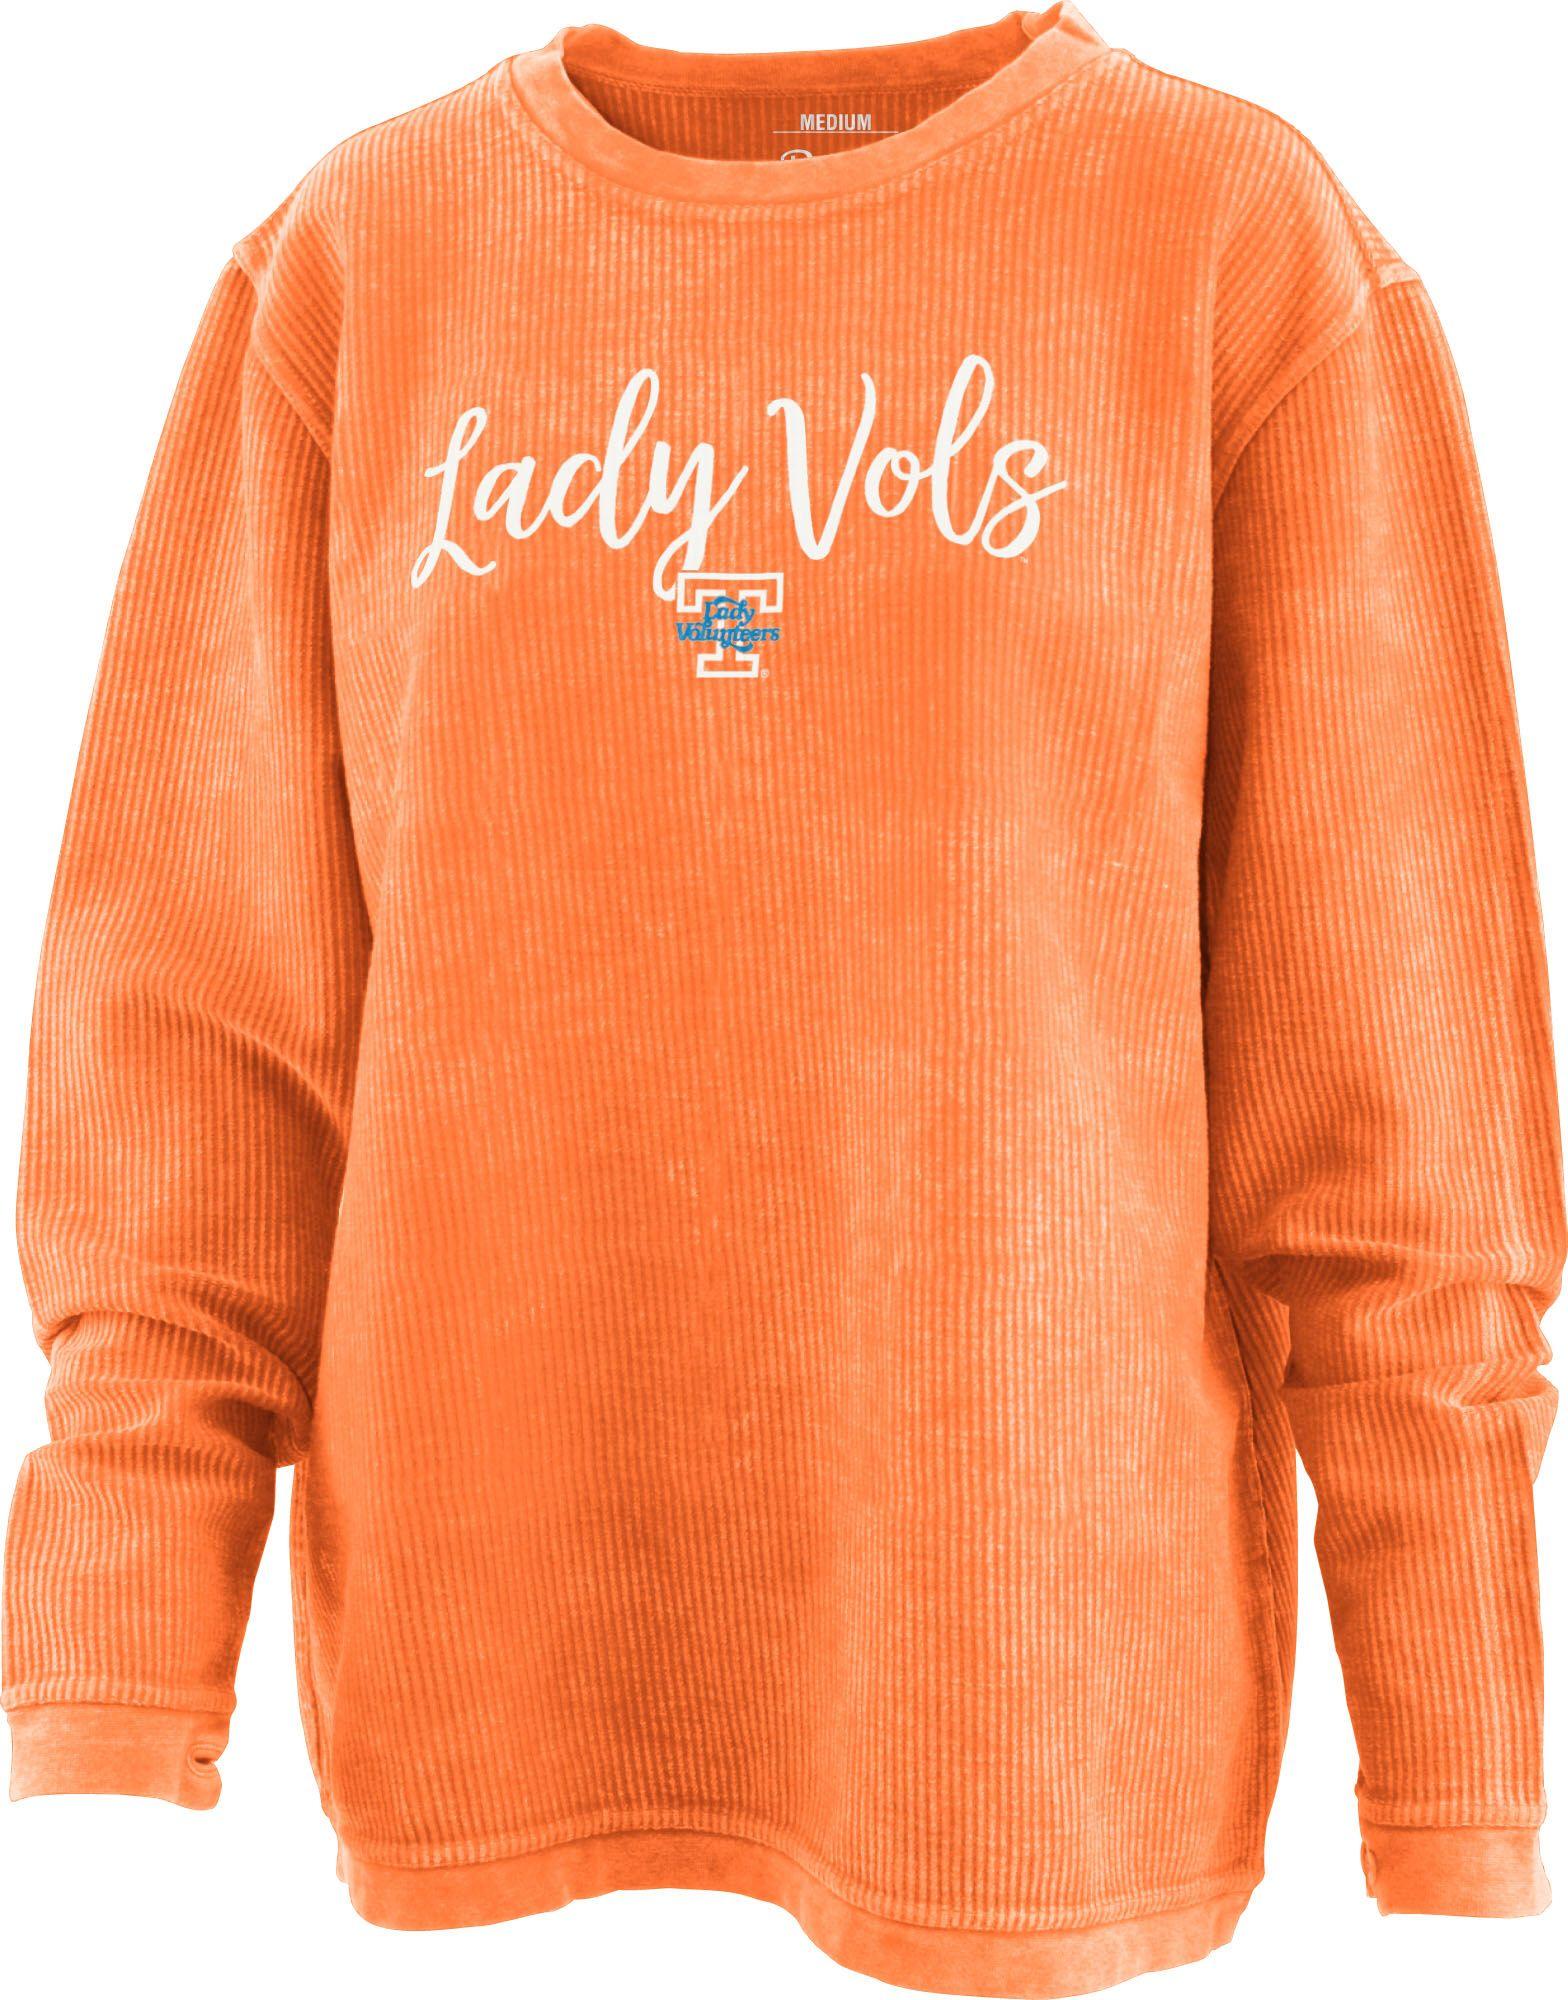 Lady Vols Orange Comfy Cords Long Sleeve Shirts Lady Shirts [ 2000 x 1568 Pixel ]